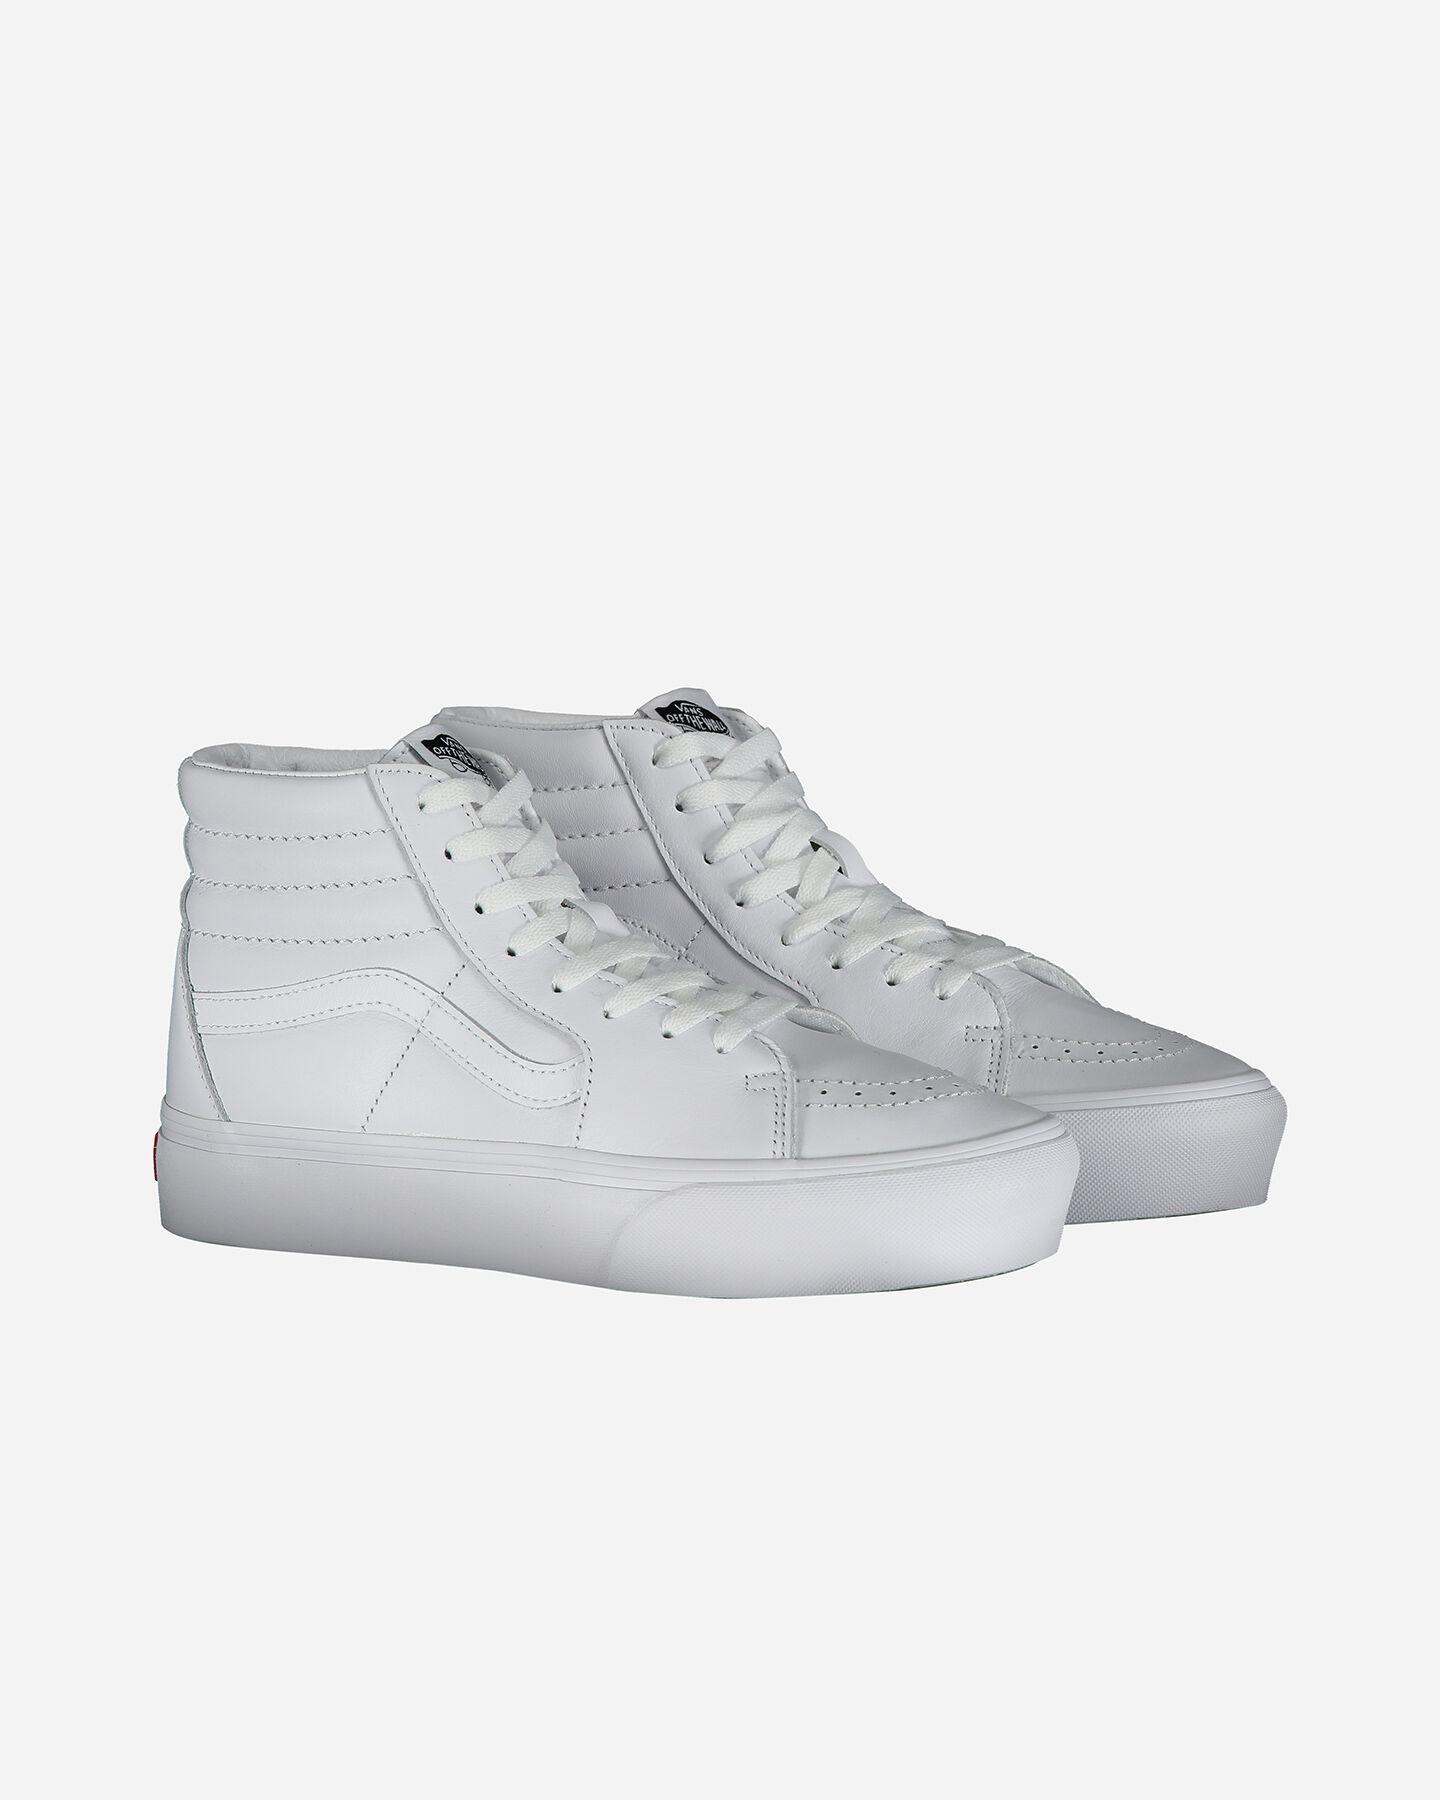 Scarpe sneakers VANS SK8-HI PLATFORM 2.0 W S5119542 scatto 1